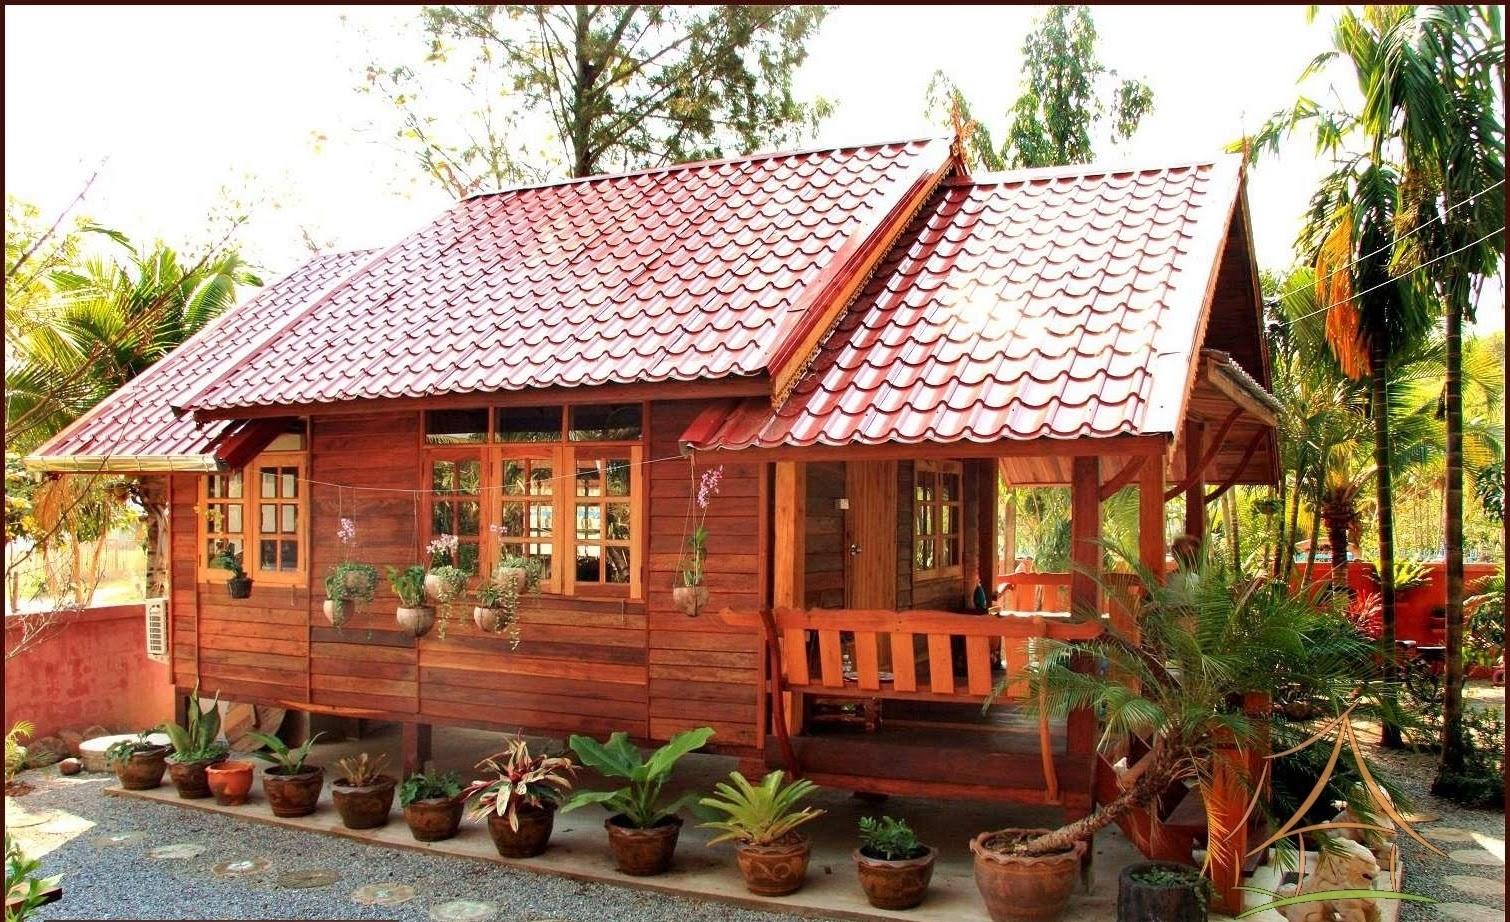 7700 Gambar Desain Rumah Kecil Minimalis Bahan Kayu Paling Keren Download